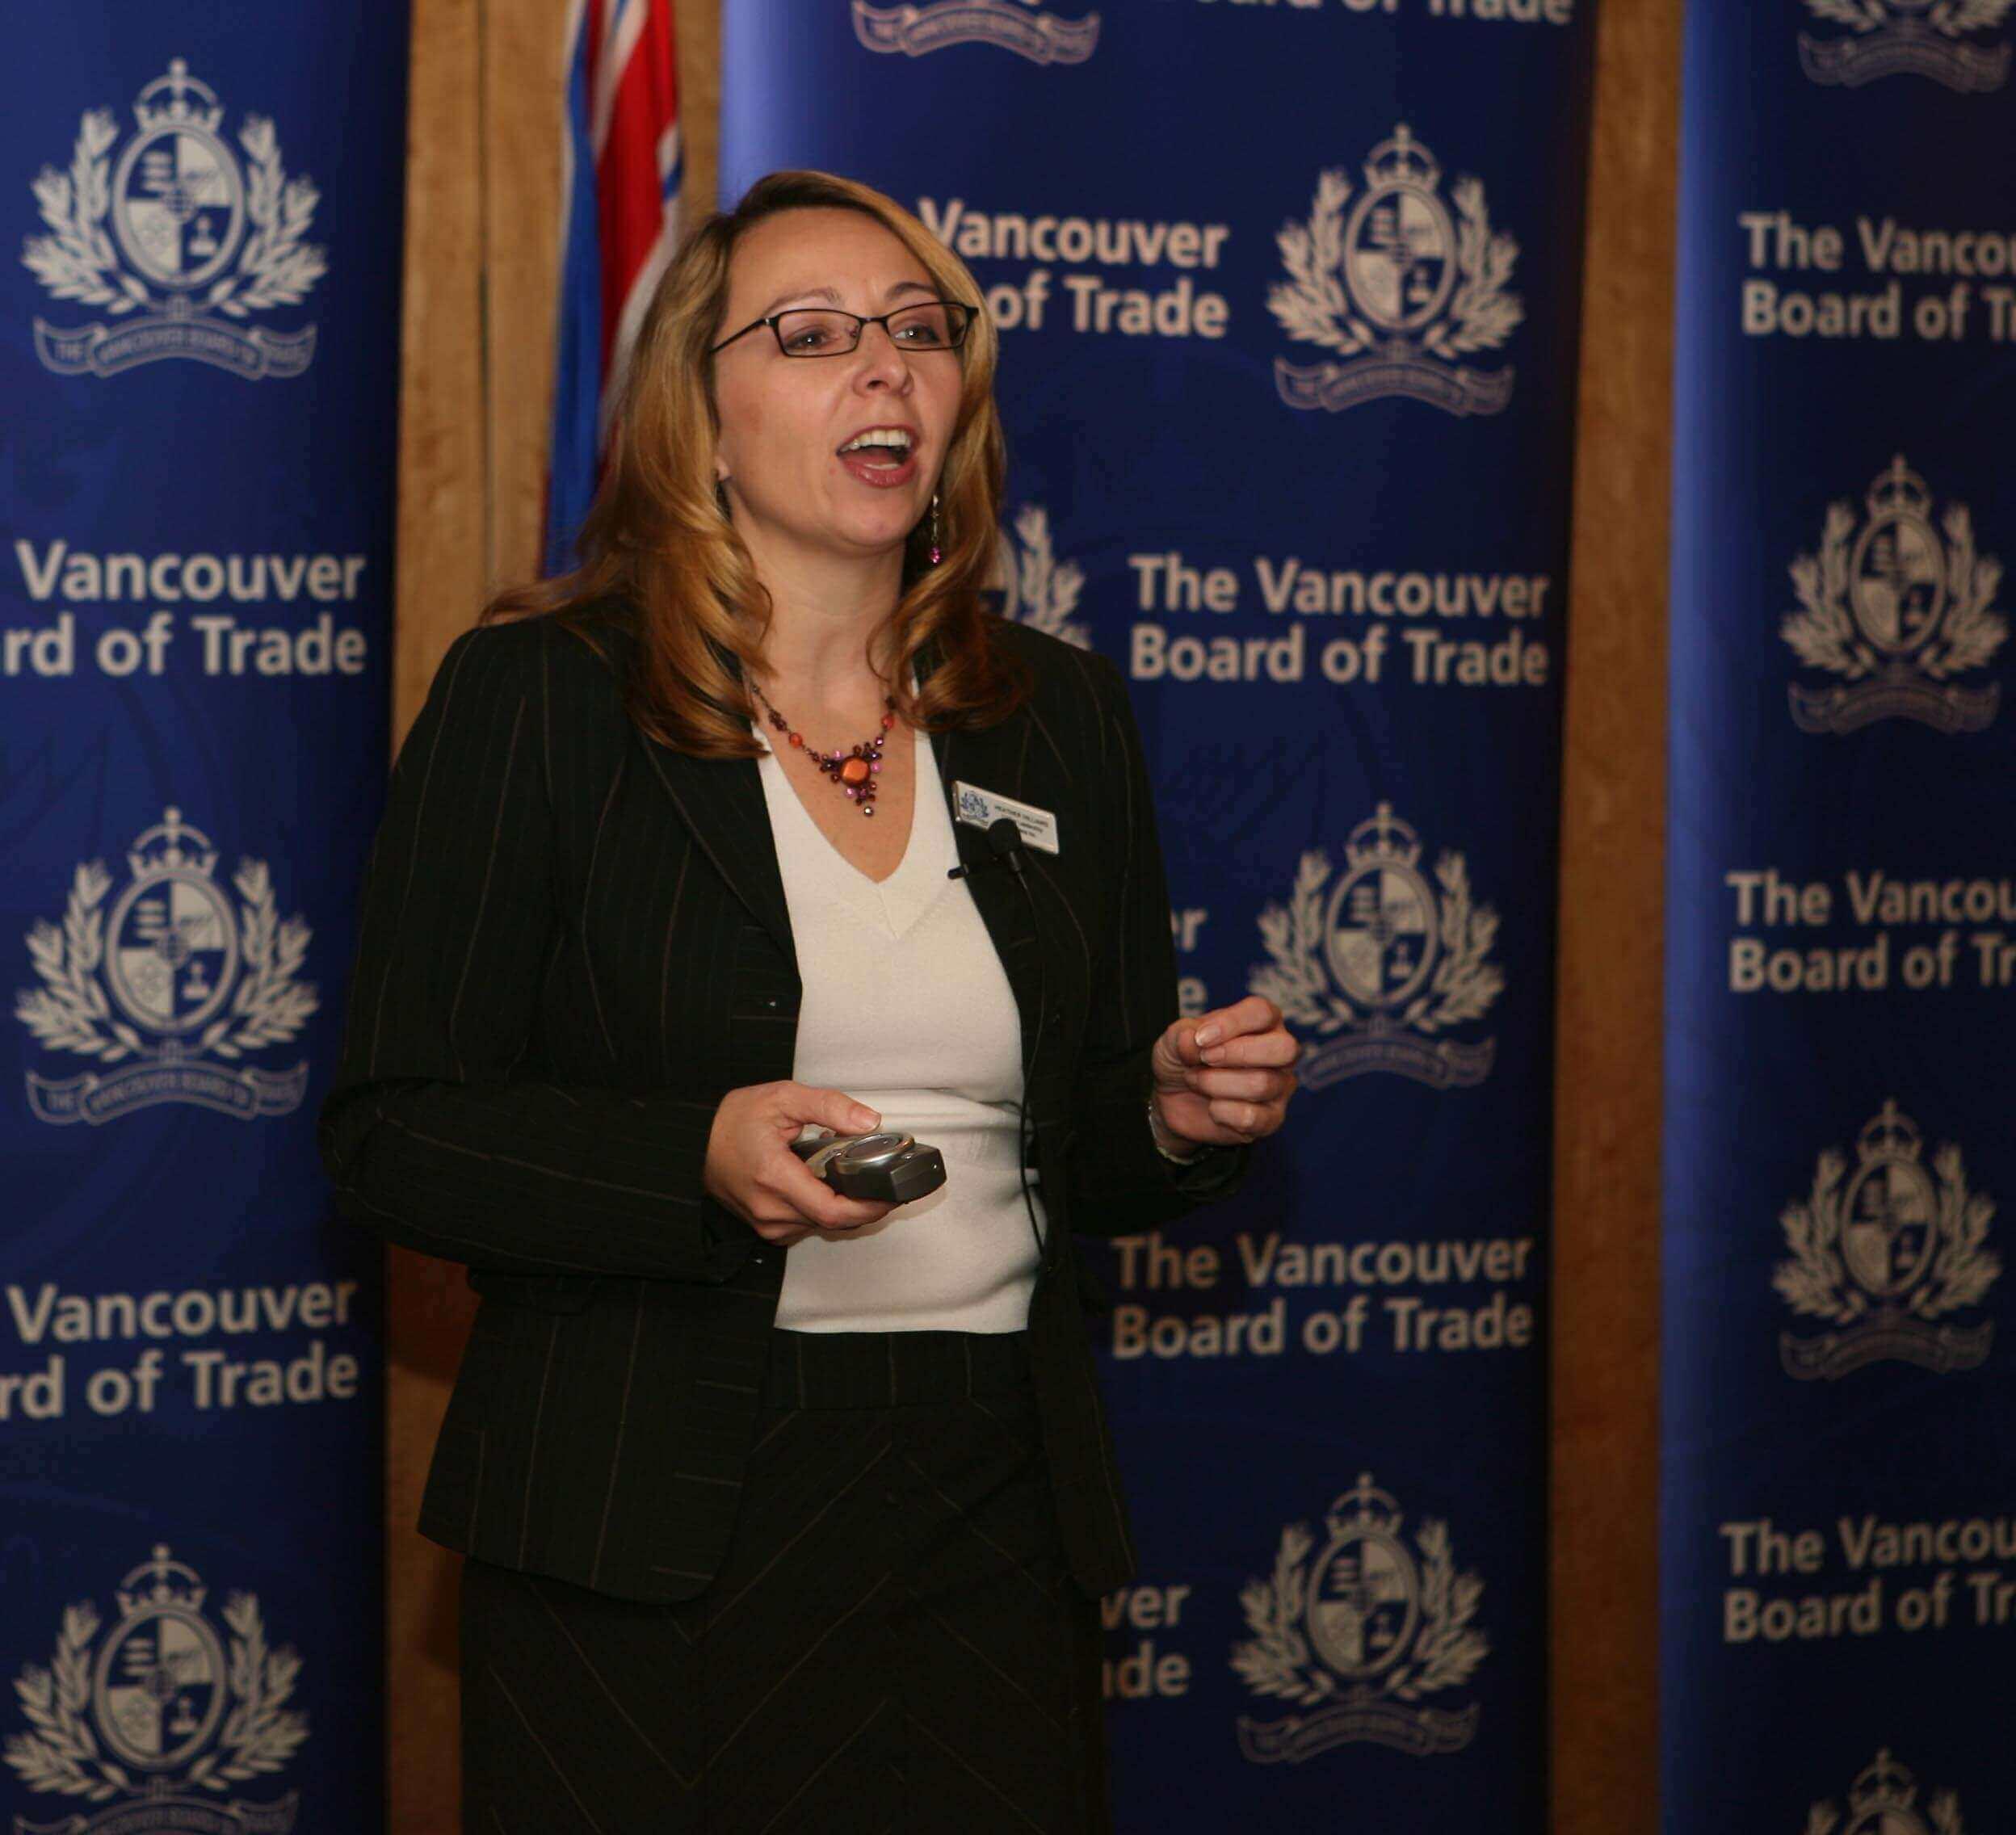 Vancouver Board of Trade - Heather Hilliard